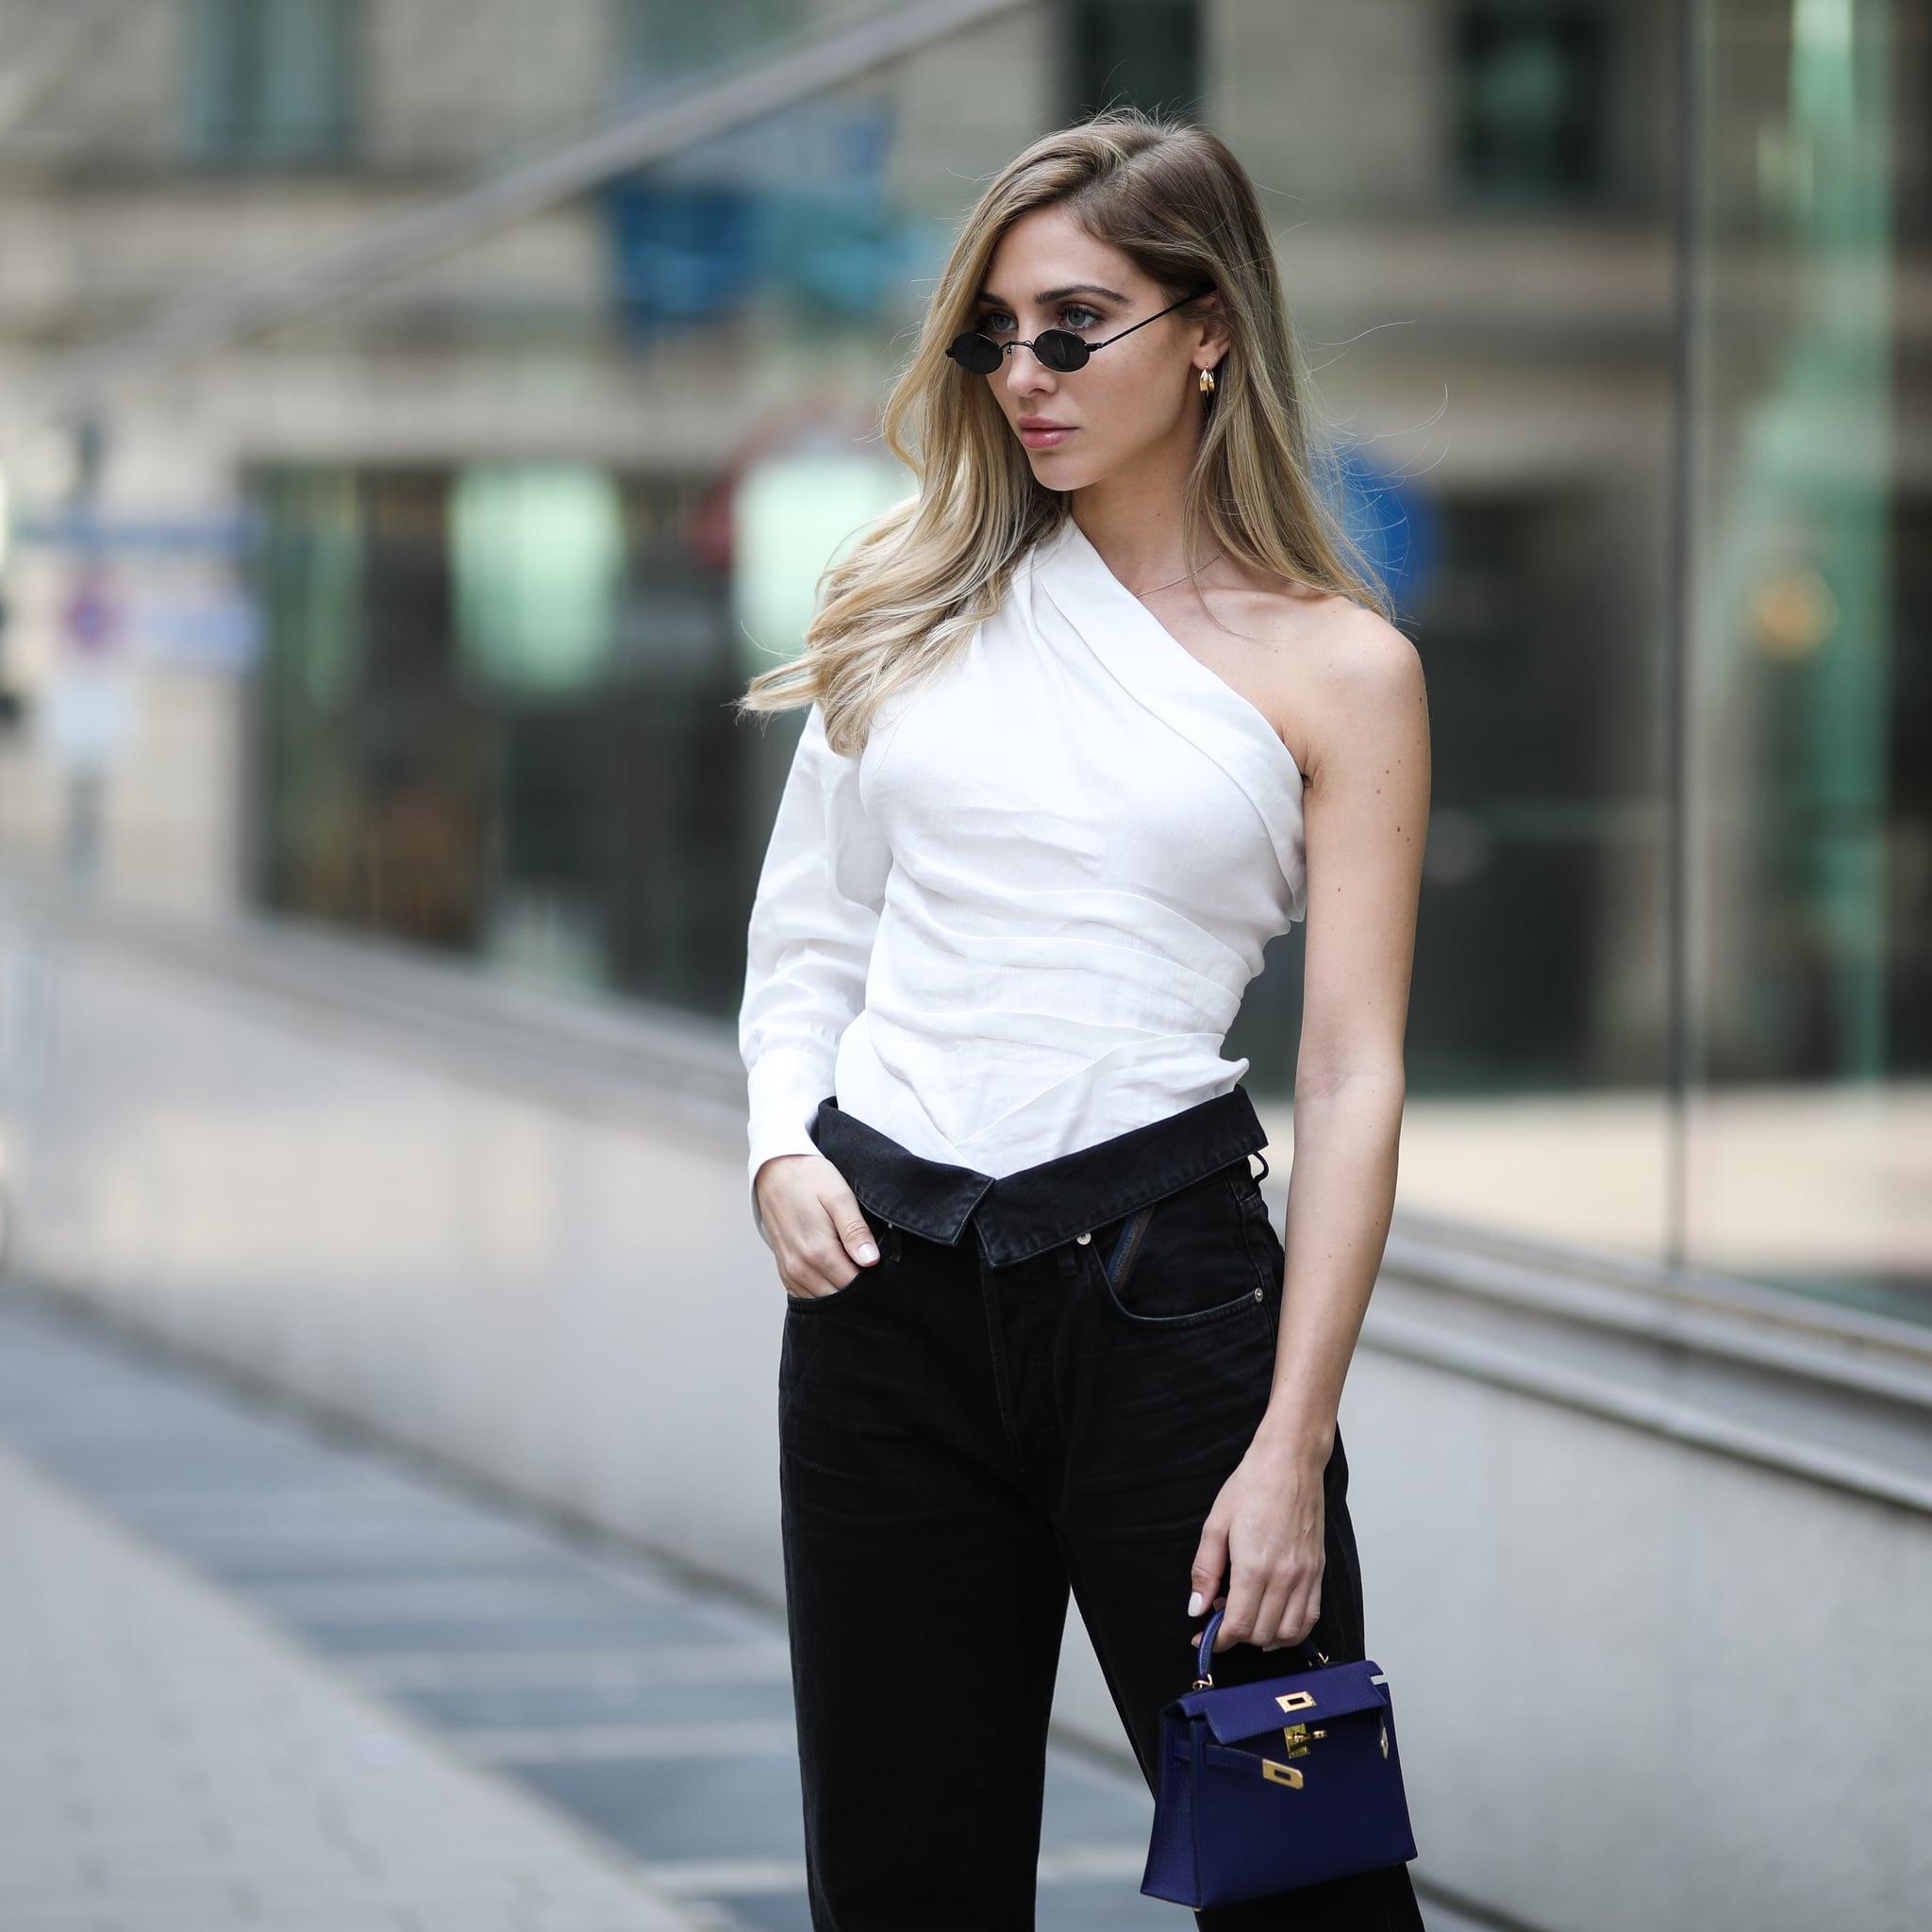 Best Tops For Spring and Summer 2019   POPSUGAR Fashion